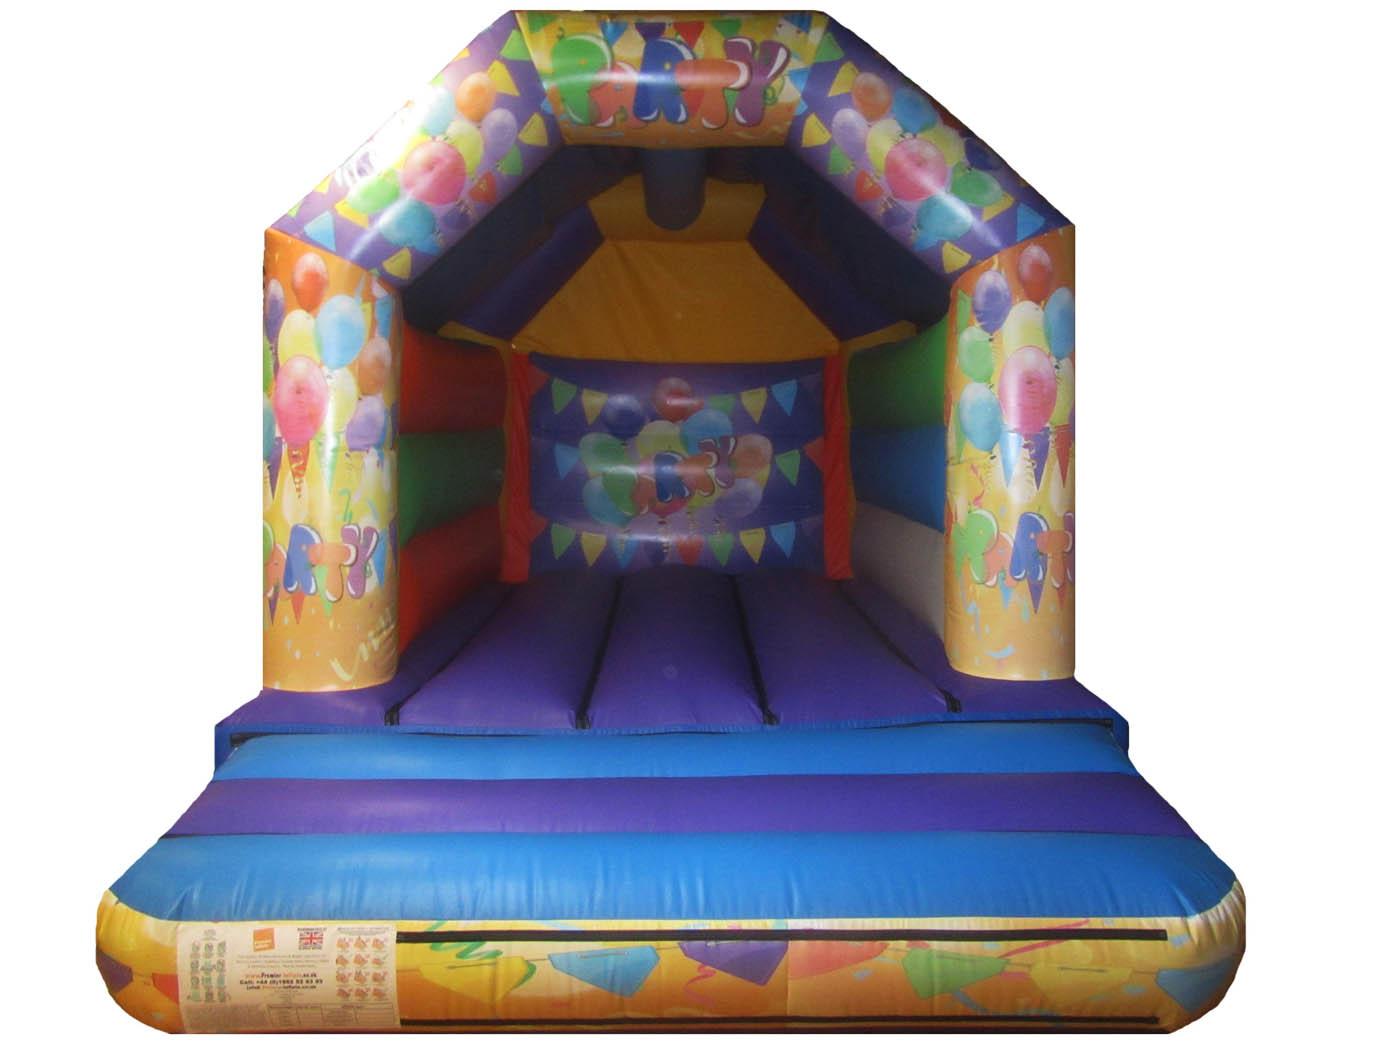 15x11-orange-purple-printed-party-bouncy-castle-compressor